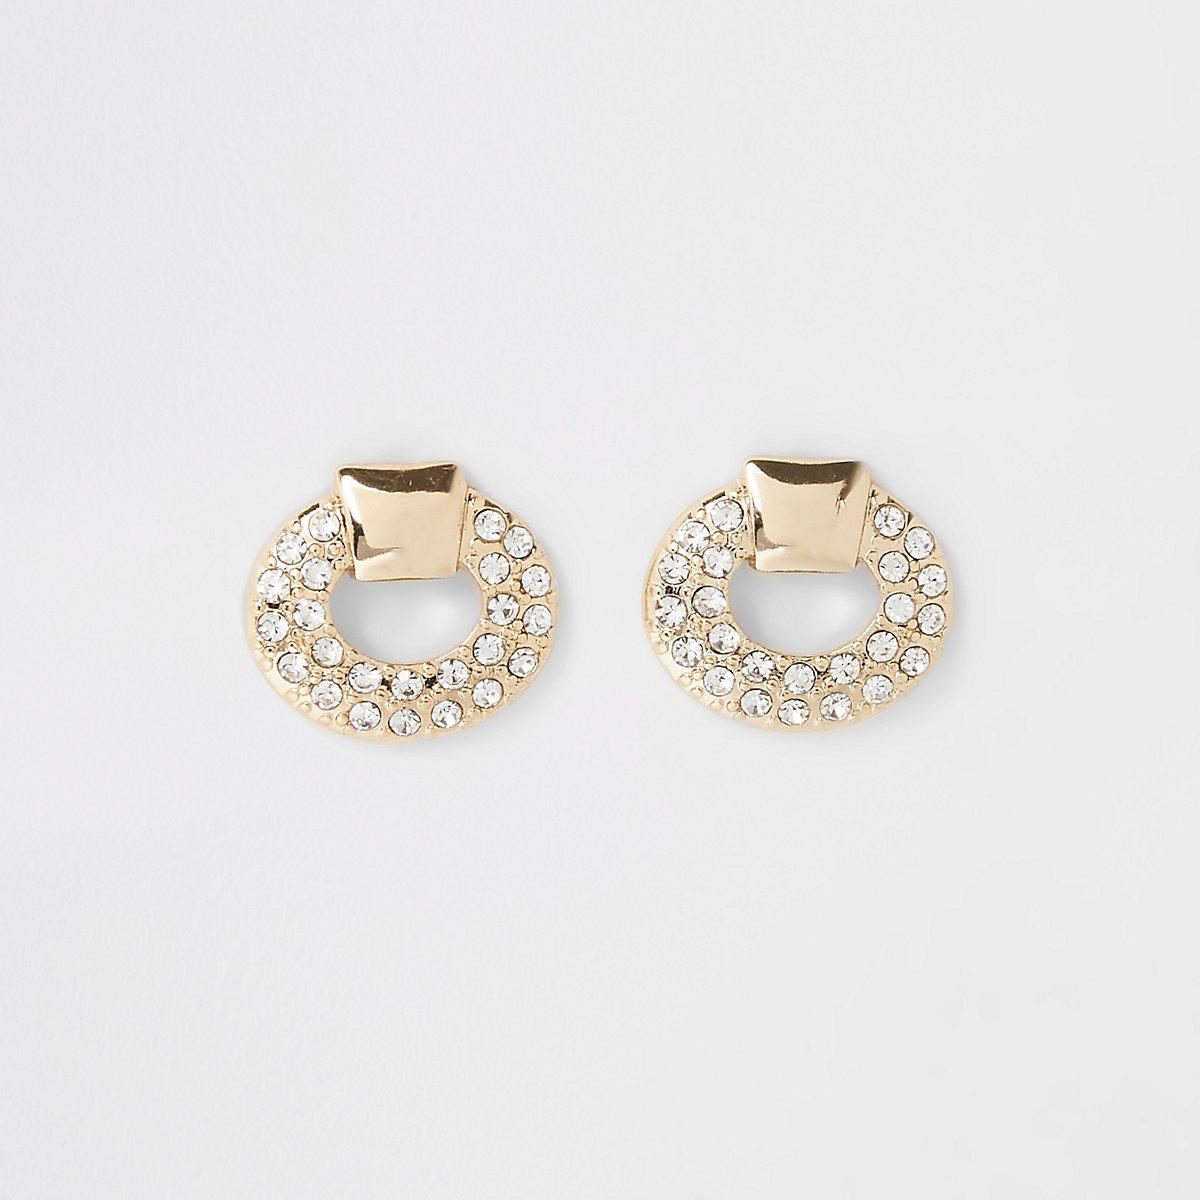 Gold color rhinestone door knocker earrings